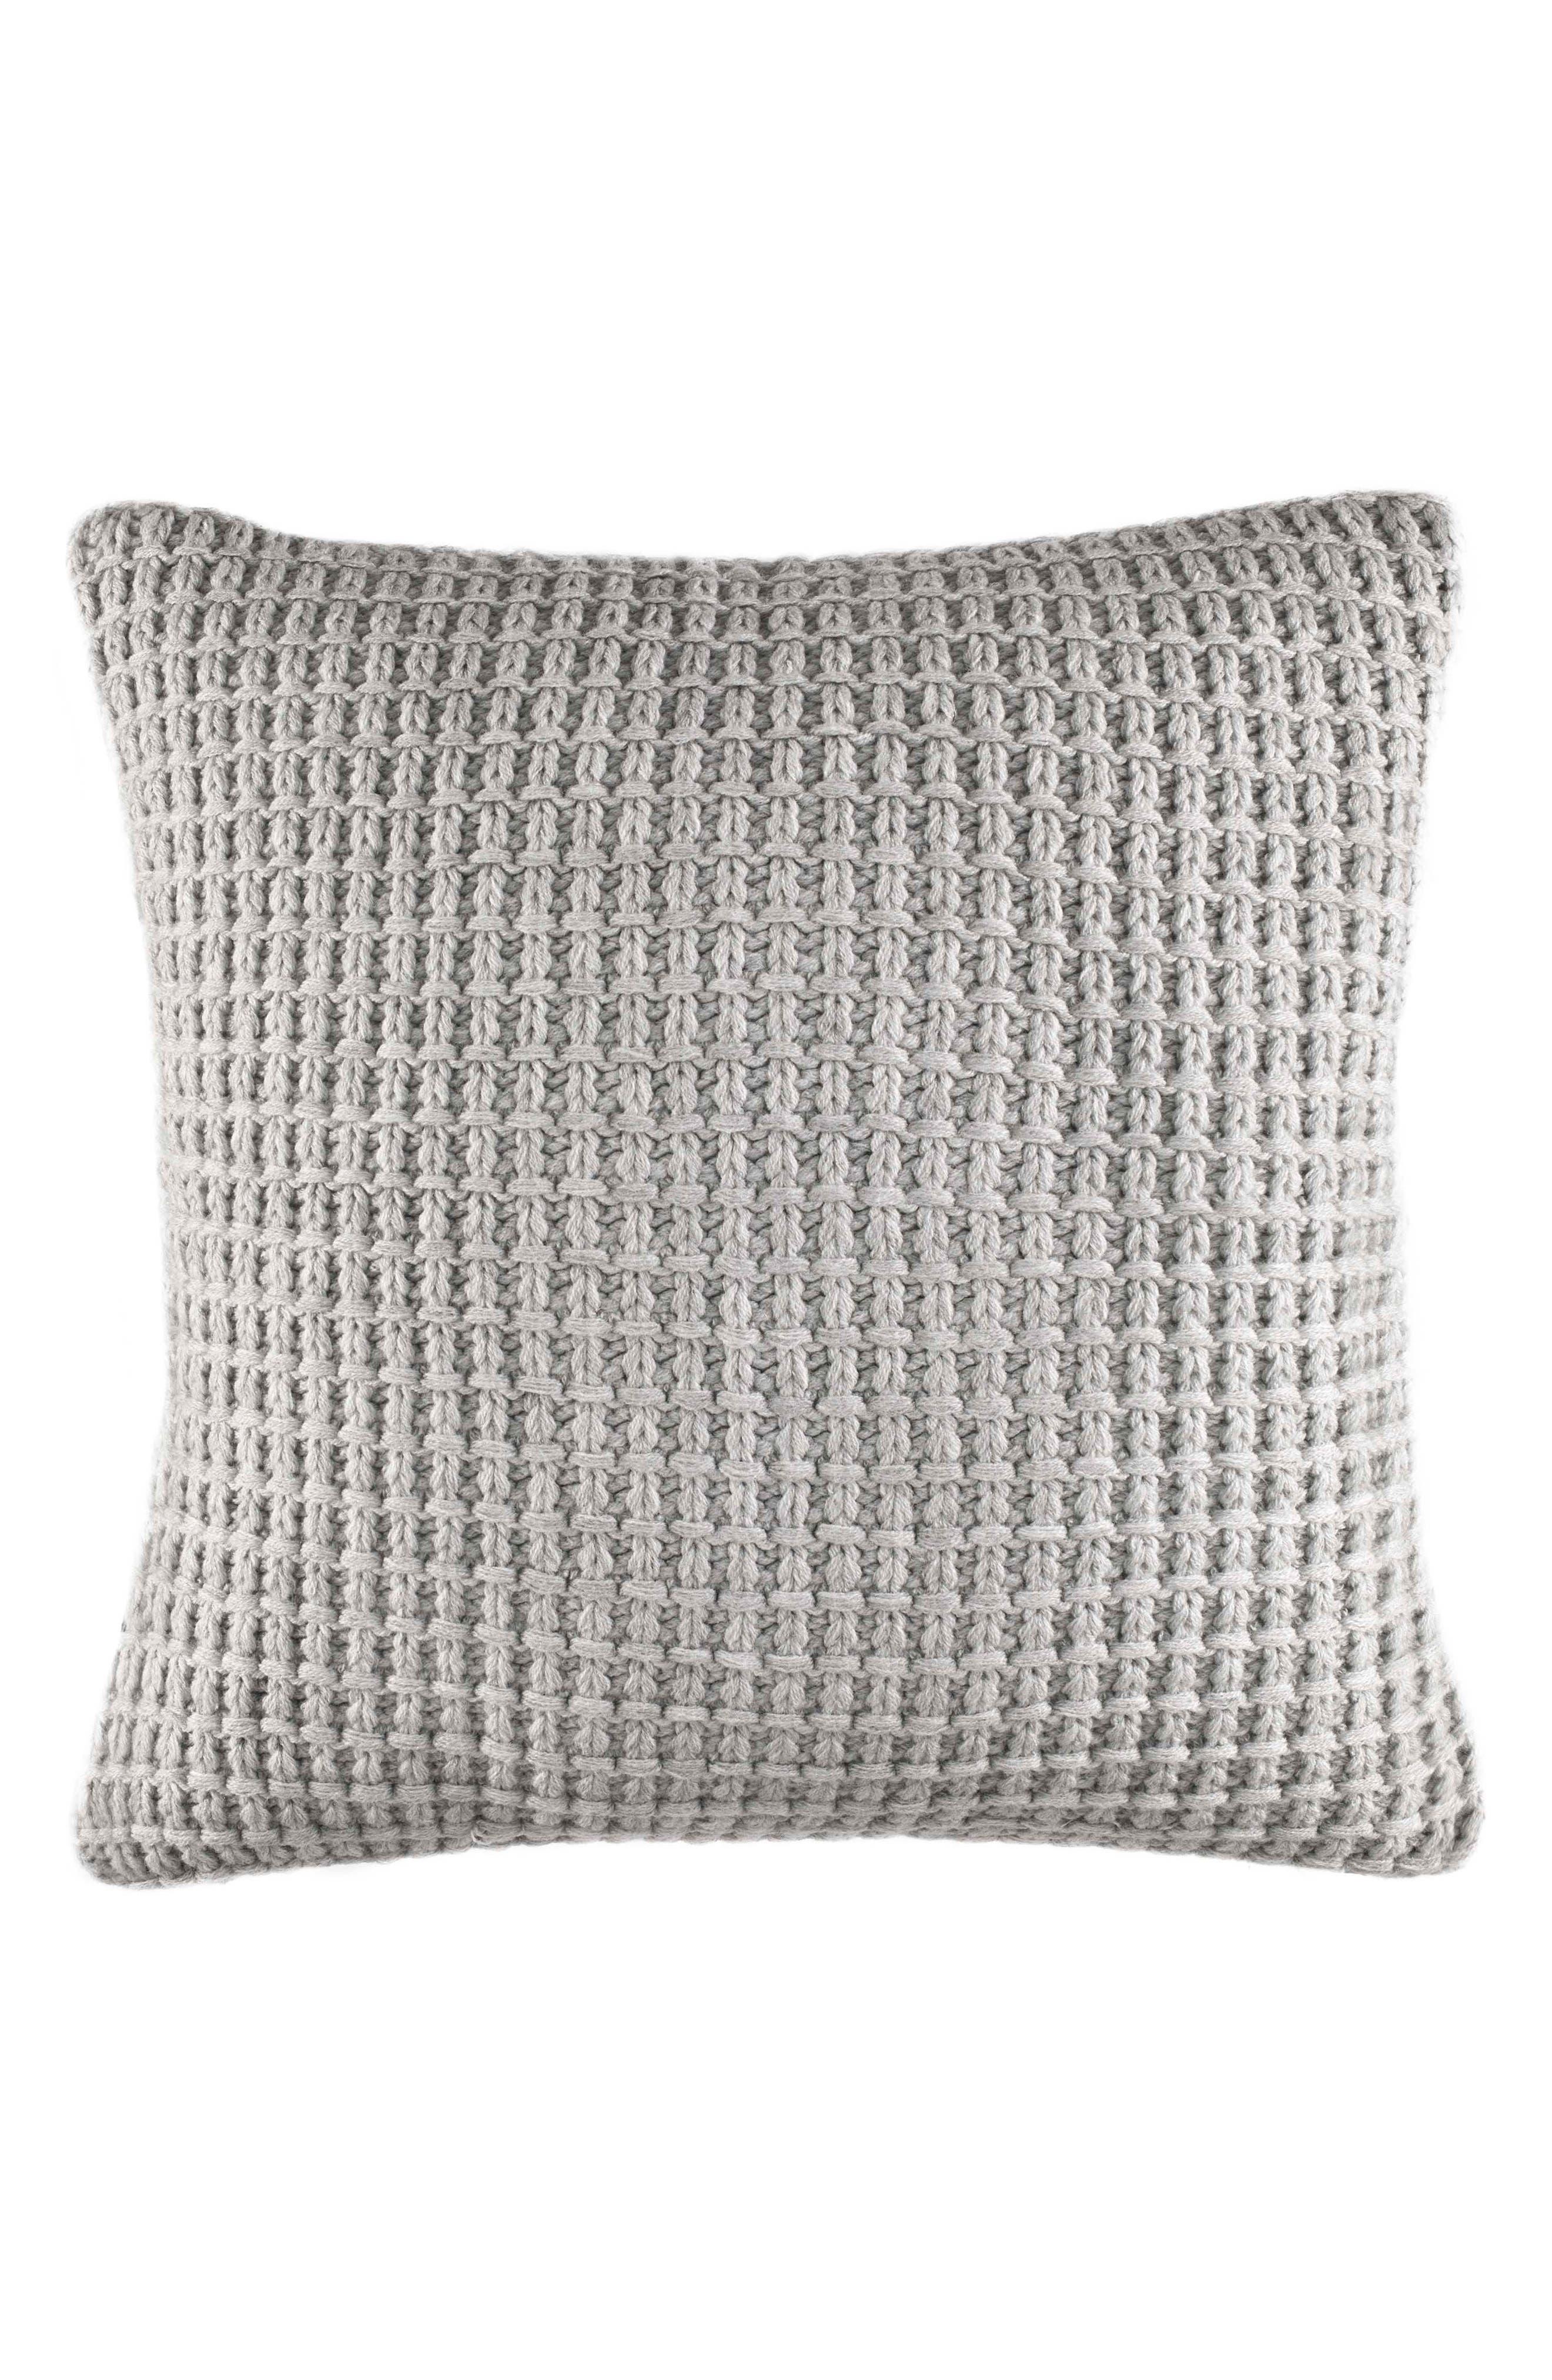 NAUTICA Grey Sweater Knit Pillow, Main, color, 020